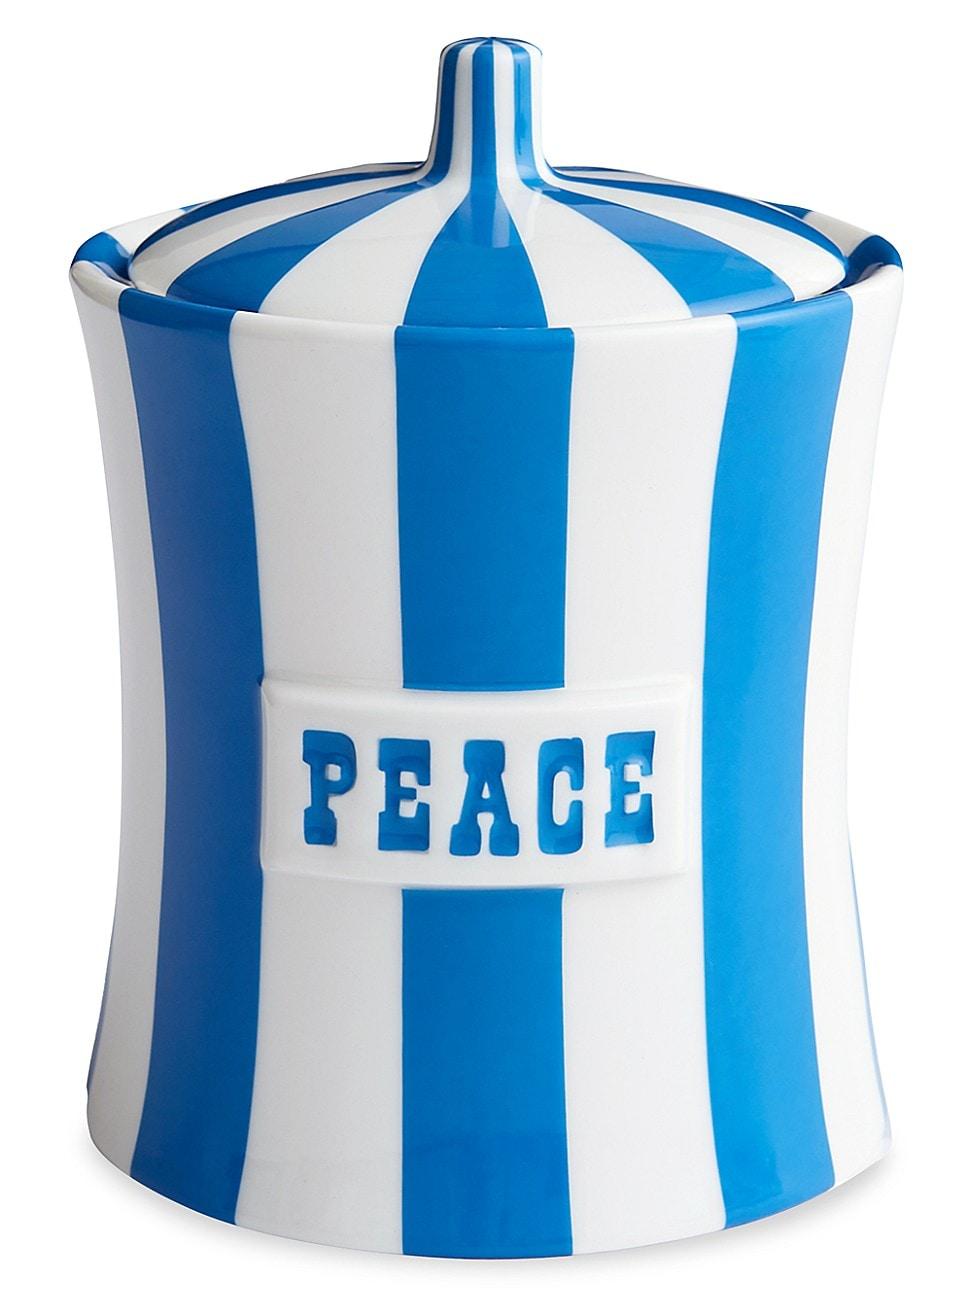 Jonathan Adler VICE STRIPE PEACE CANISTER